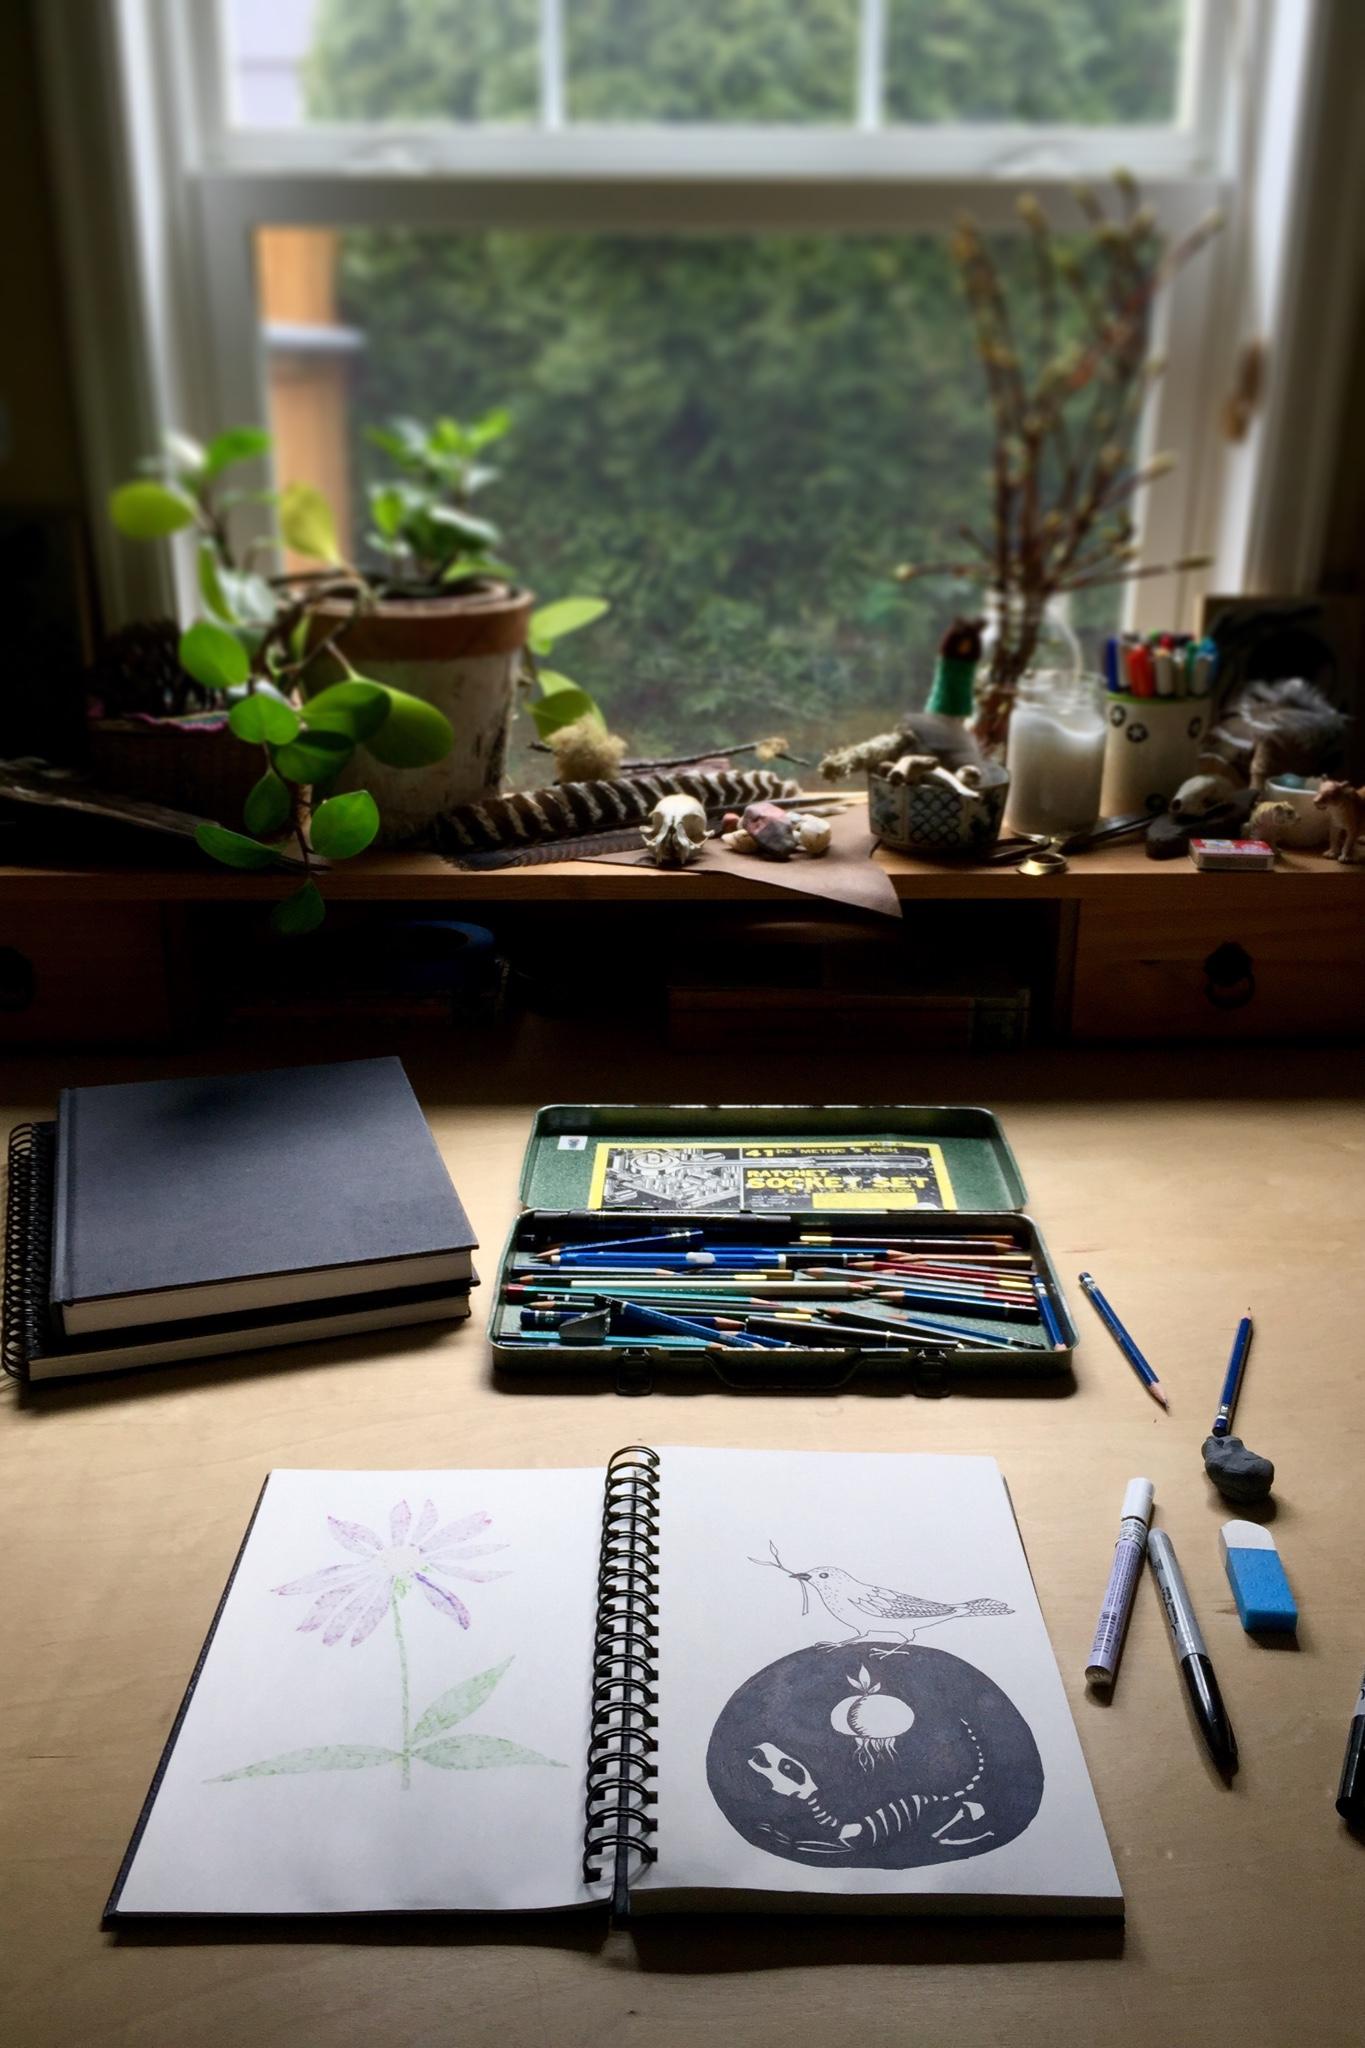 Tiger Food Press sketchbook and studio